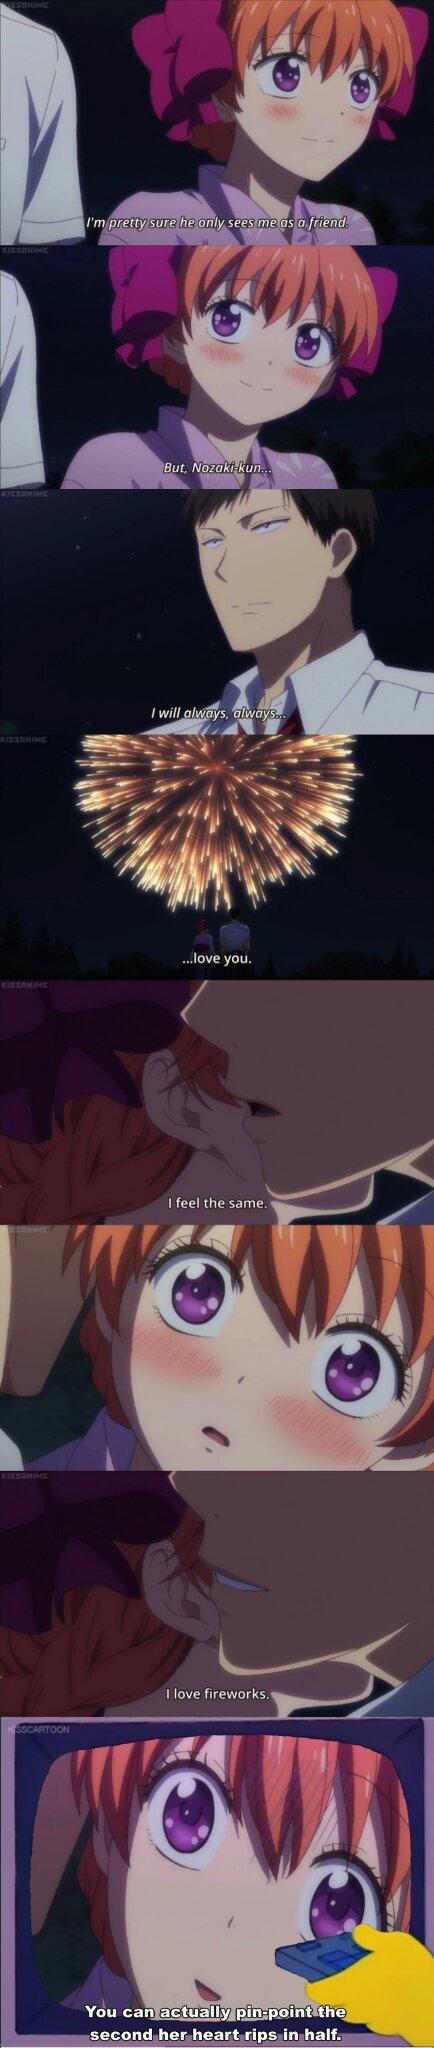 Anime is Gekkan Shoujo Nozaki-kun - meme